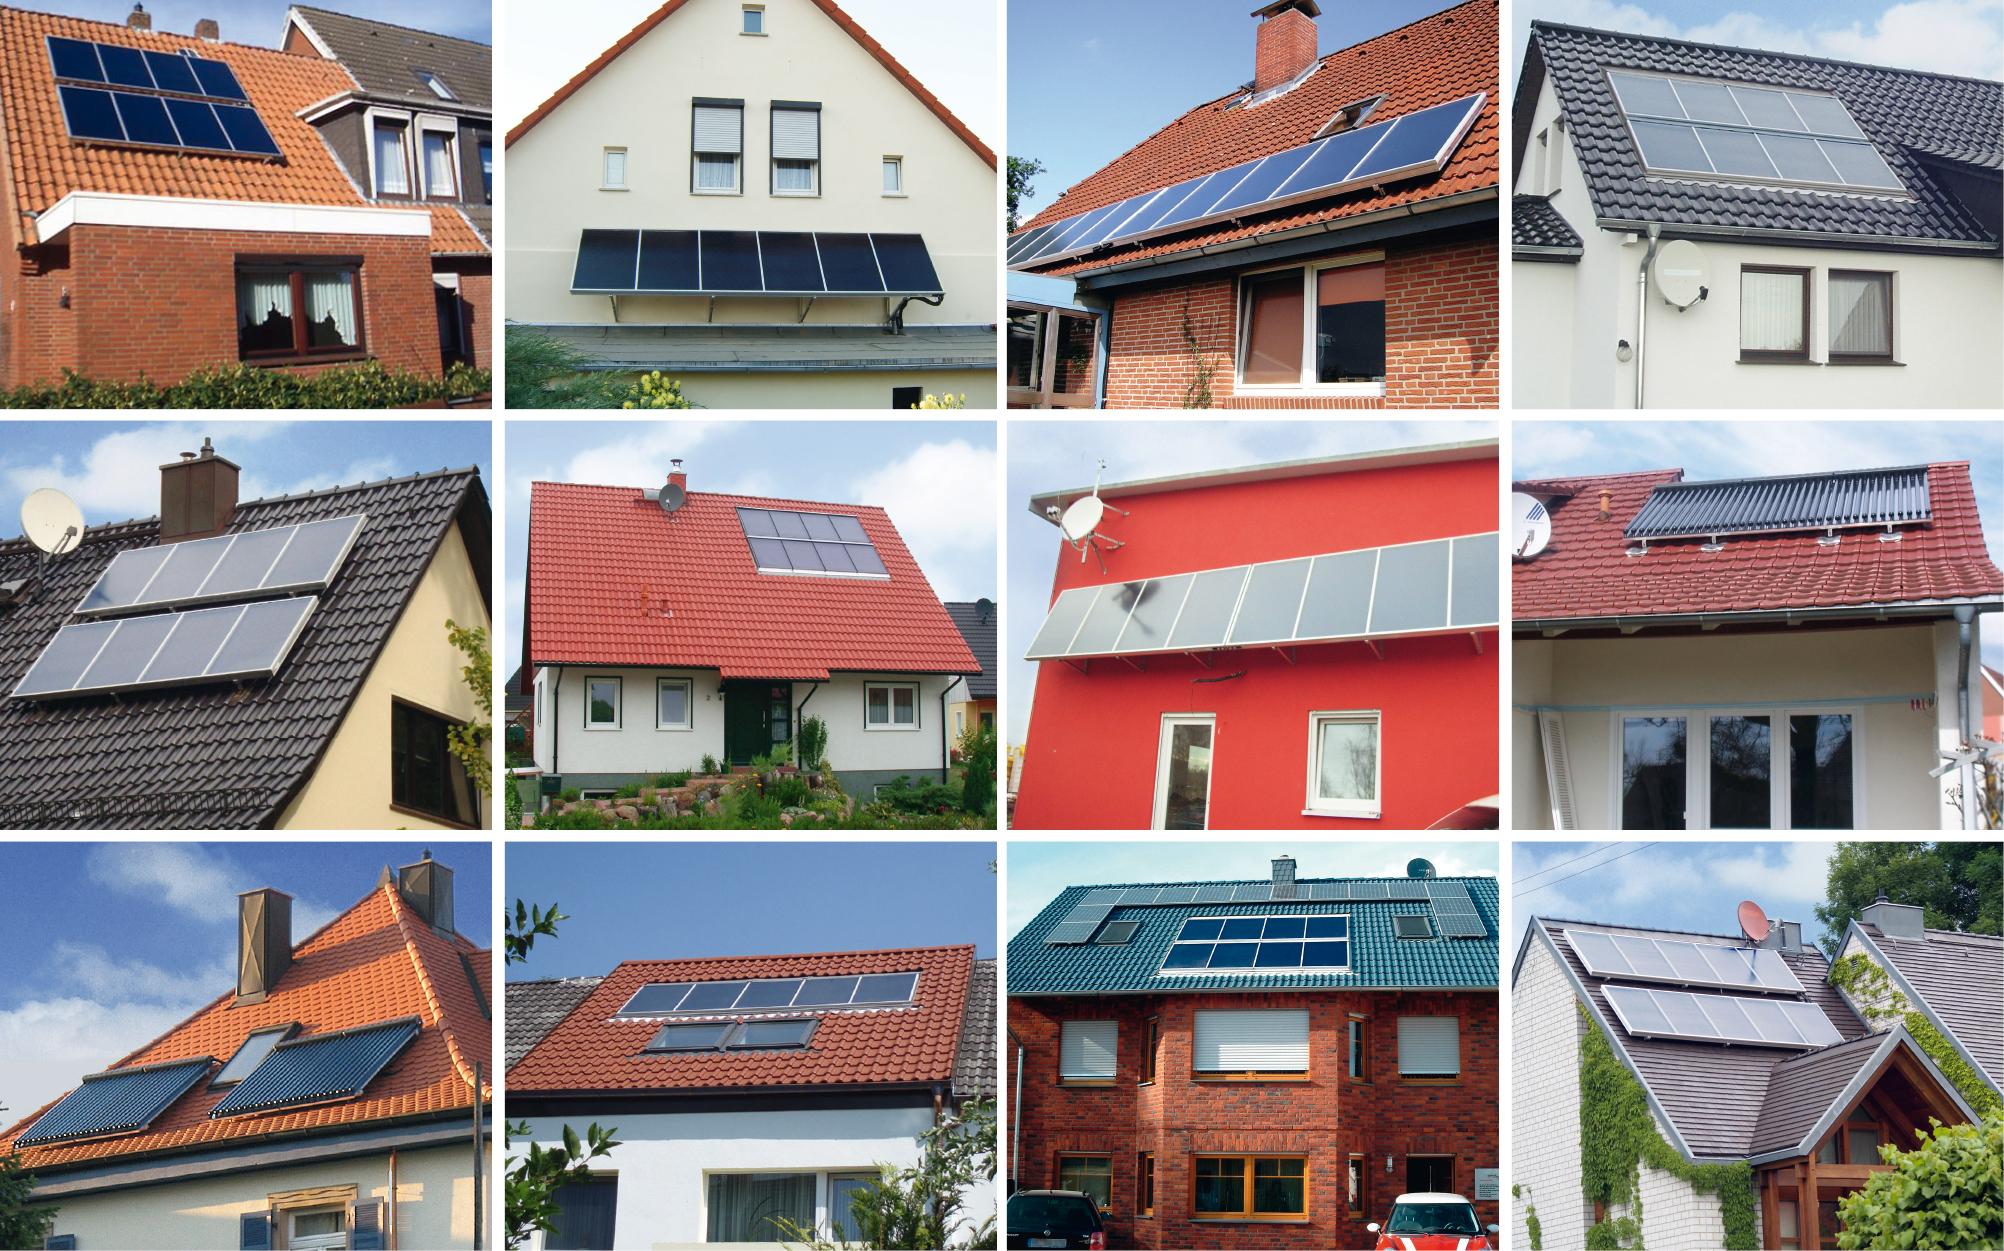 Foto: Solvis GmbH & Co. KG